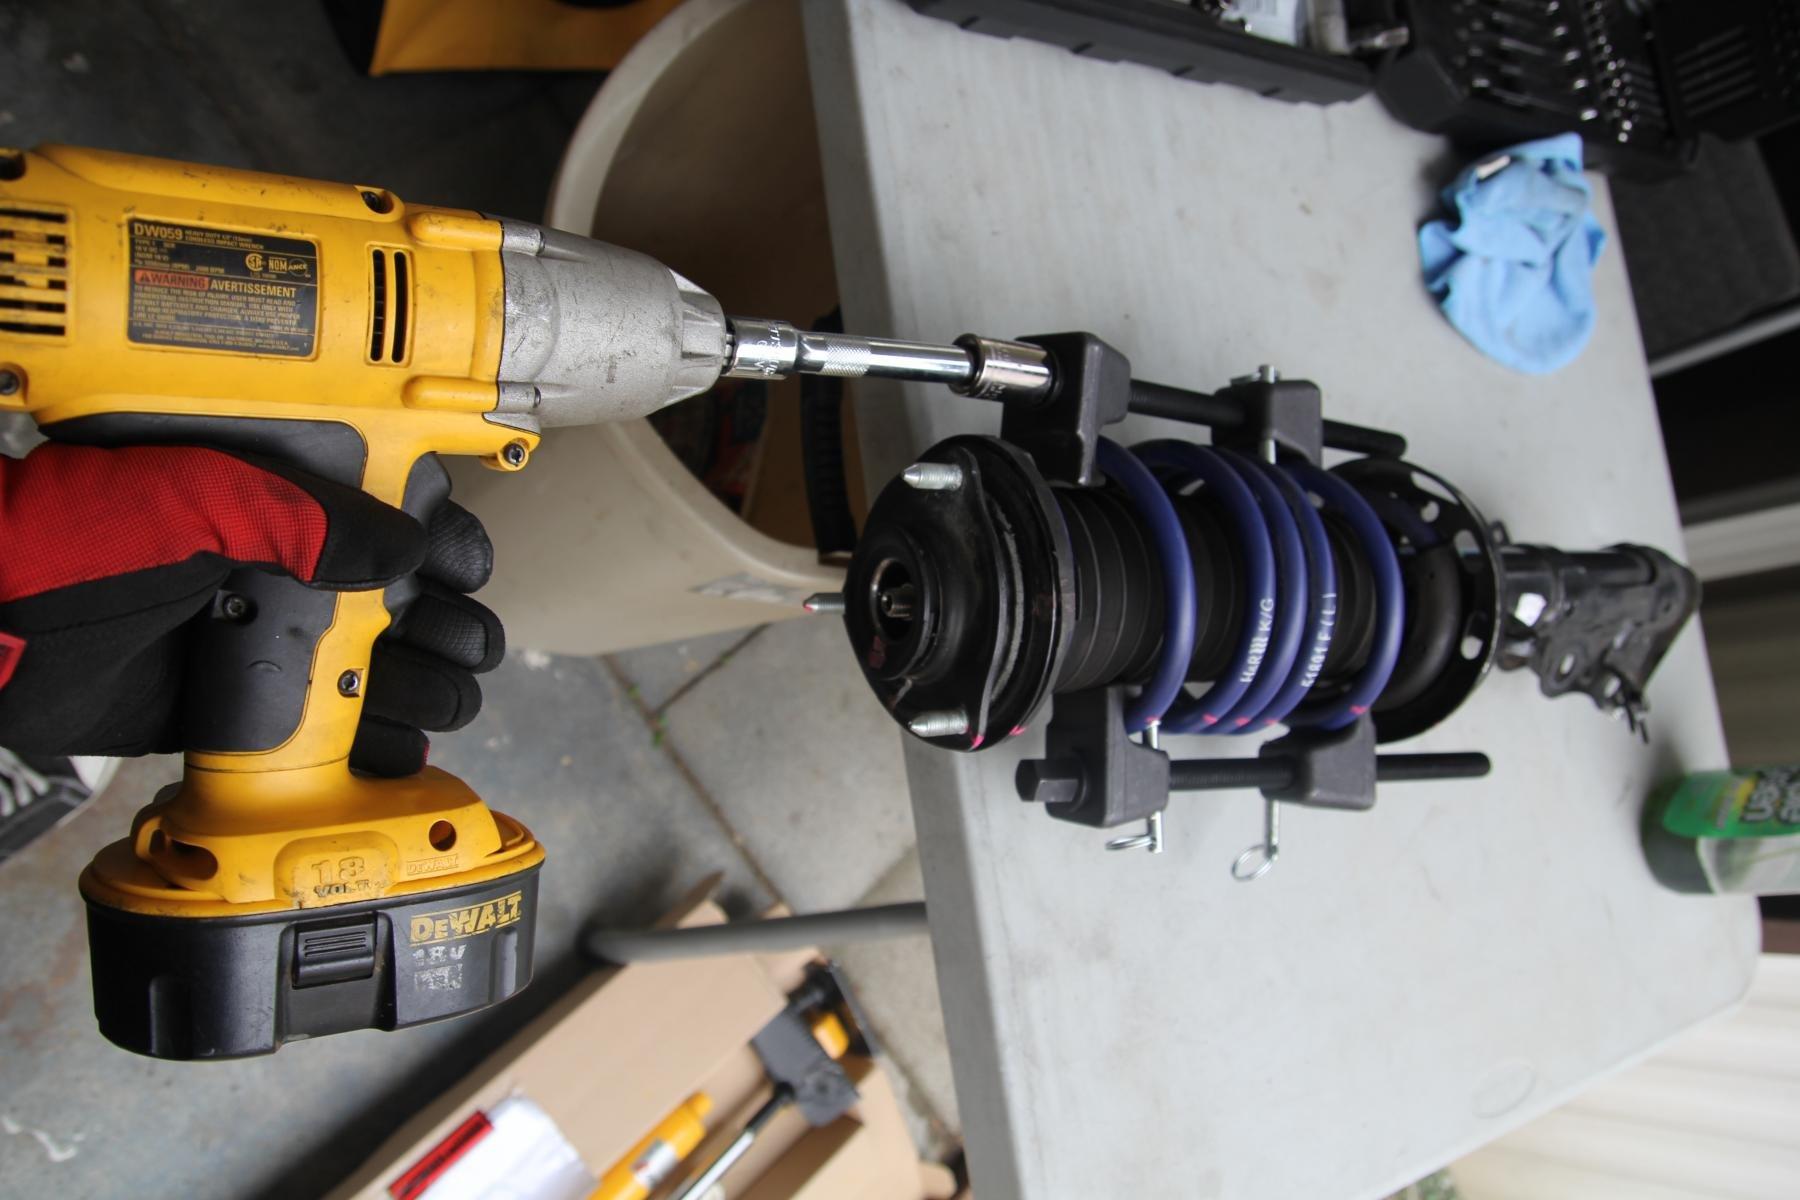 Koni Front Shock Intsall DIY. PIC HEAVY THREAD!-img_2978.jpg